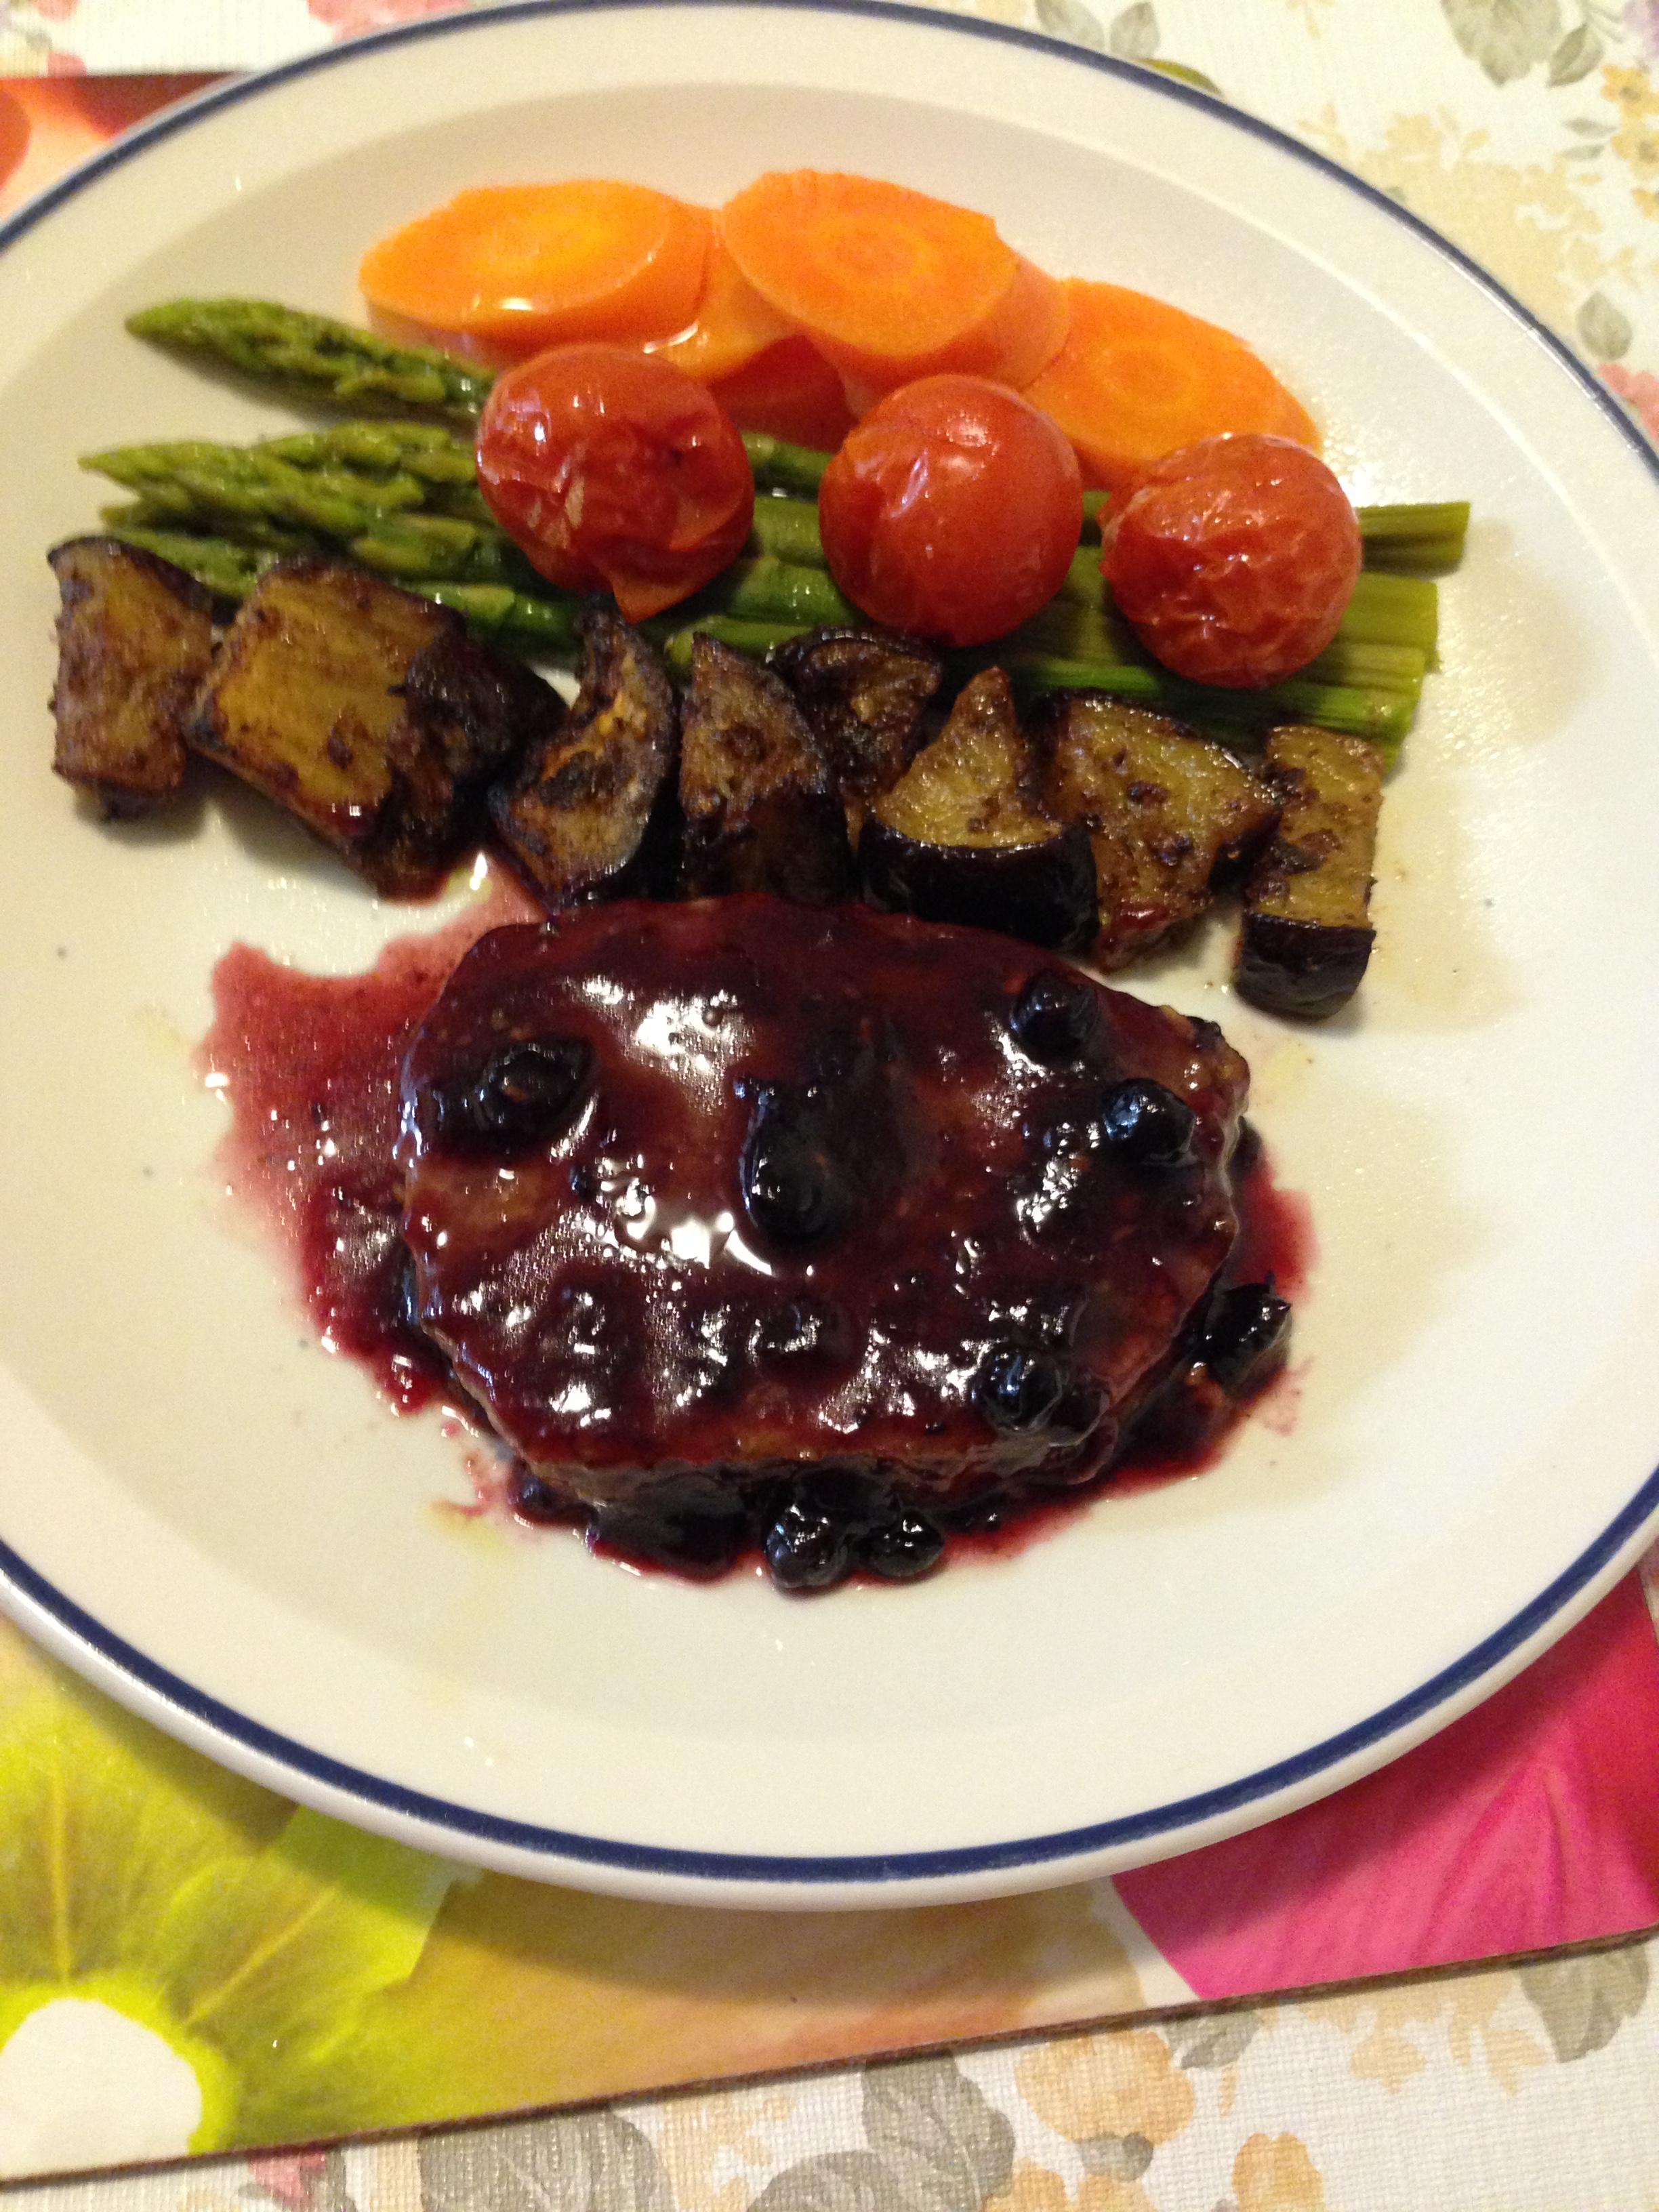 Blackberries ribeye, cherries,eggplants roast with boiled asparagus and carrot